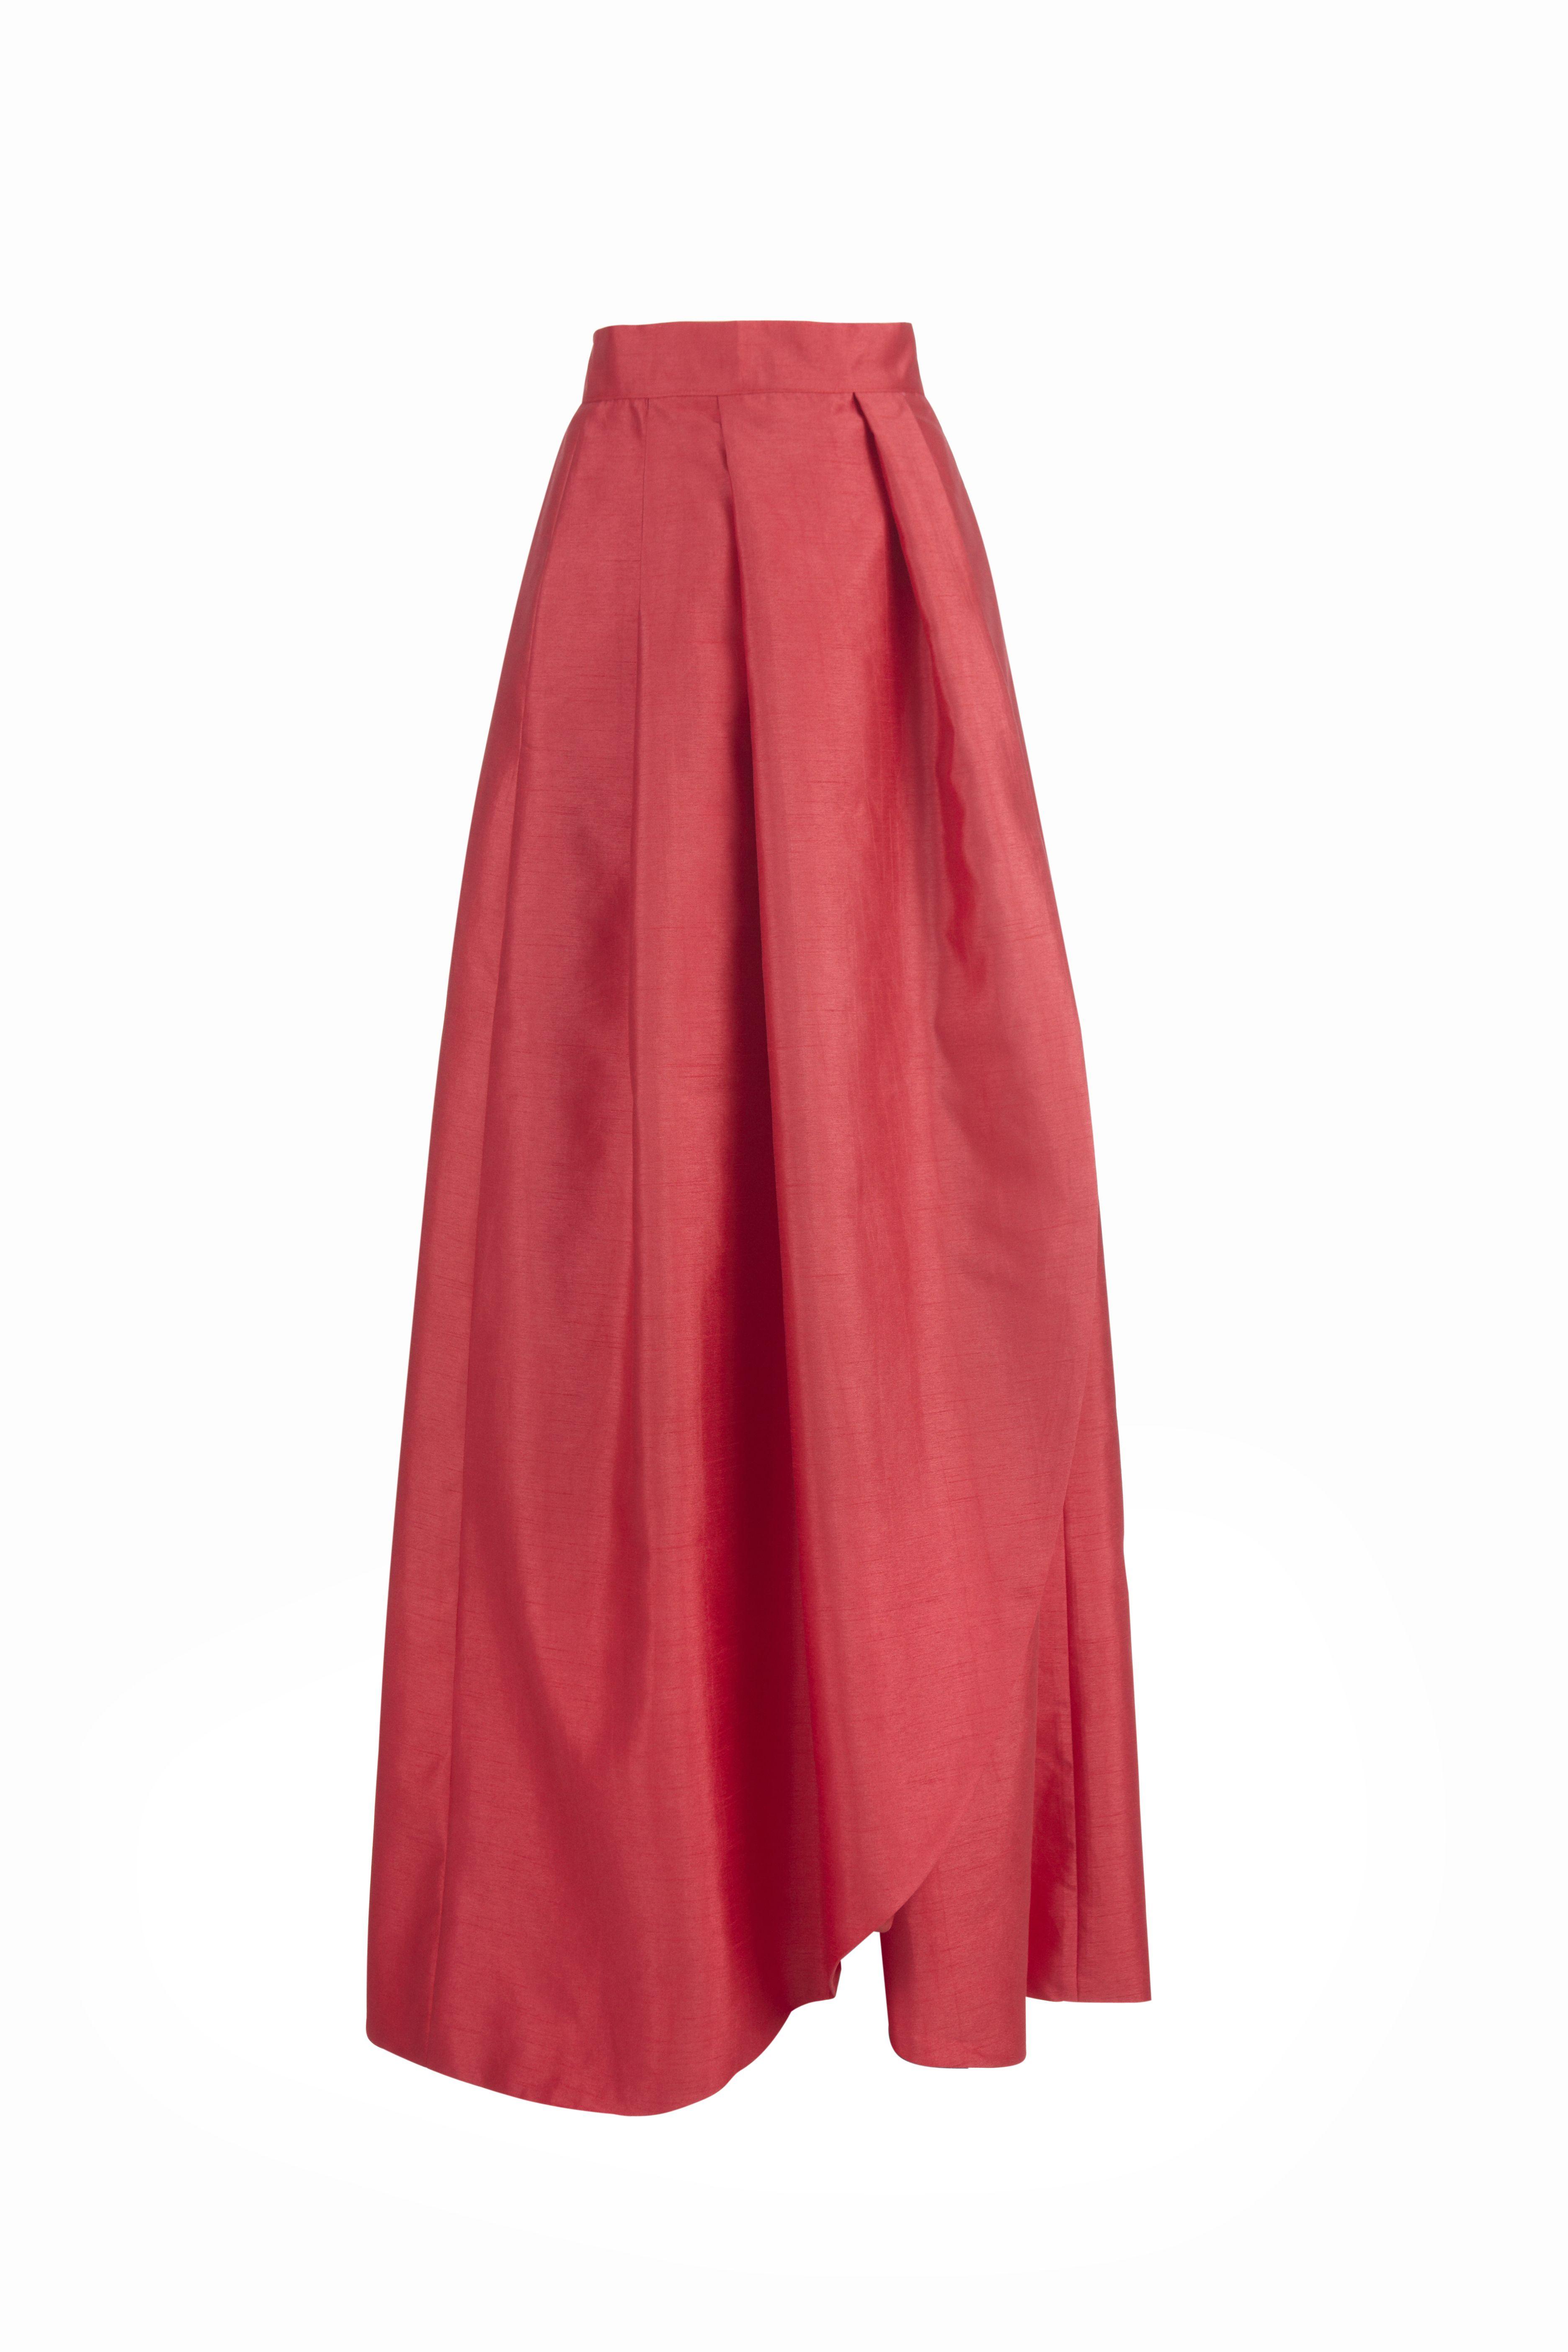 dcbcefdf1 Falda larga Victoria roja Miticca by Isabella Gobarodi | Outfit ...